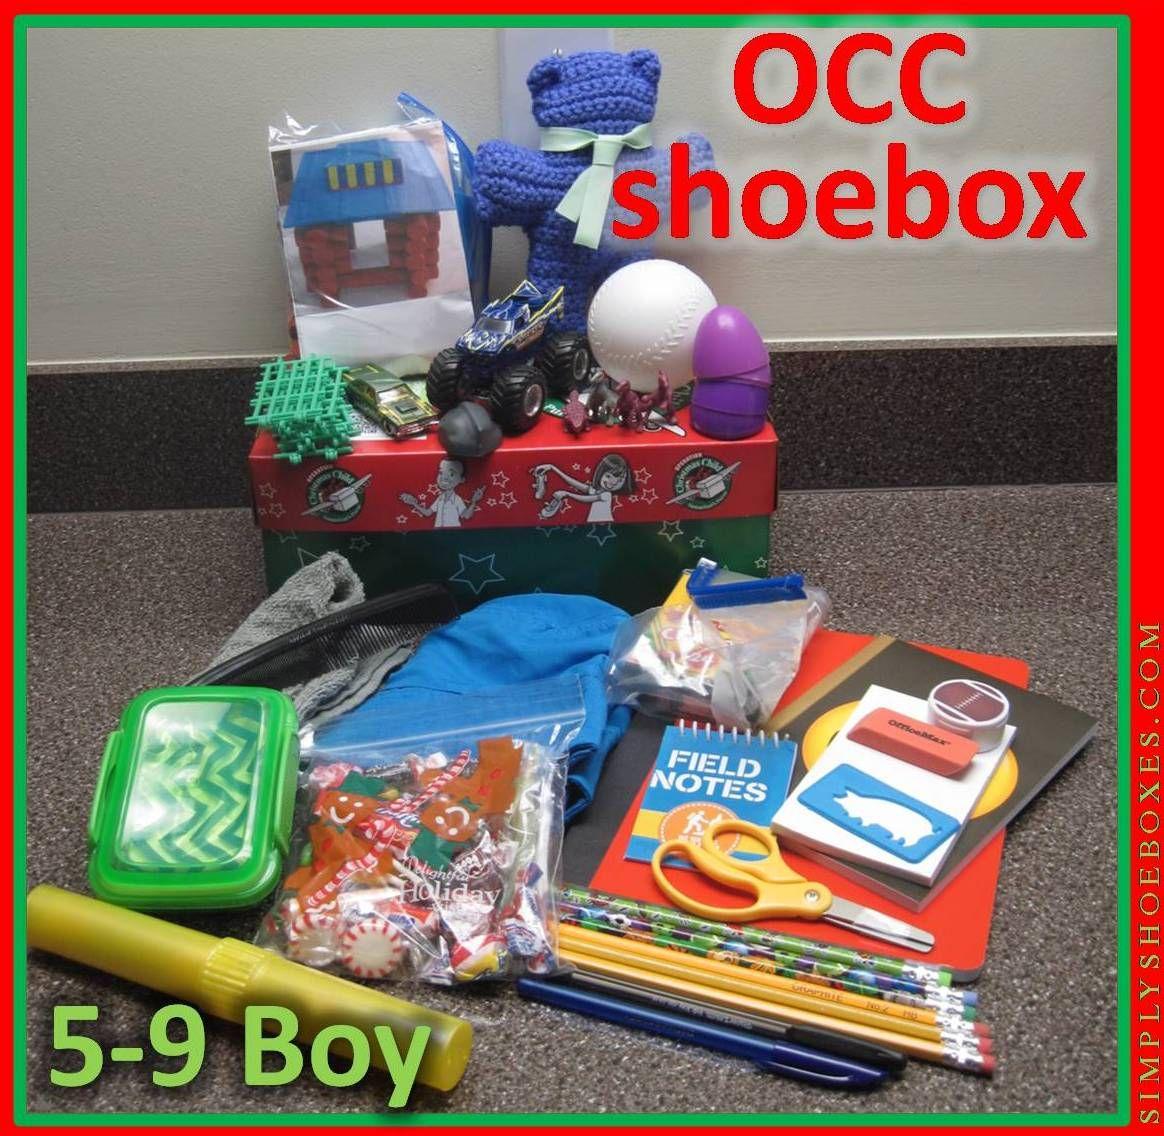 5 to 9 Year Old Boy Operation Christmas Child Shoebox | Weihnachten ...